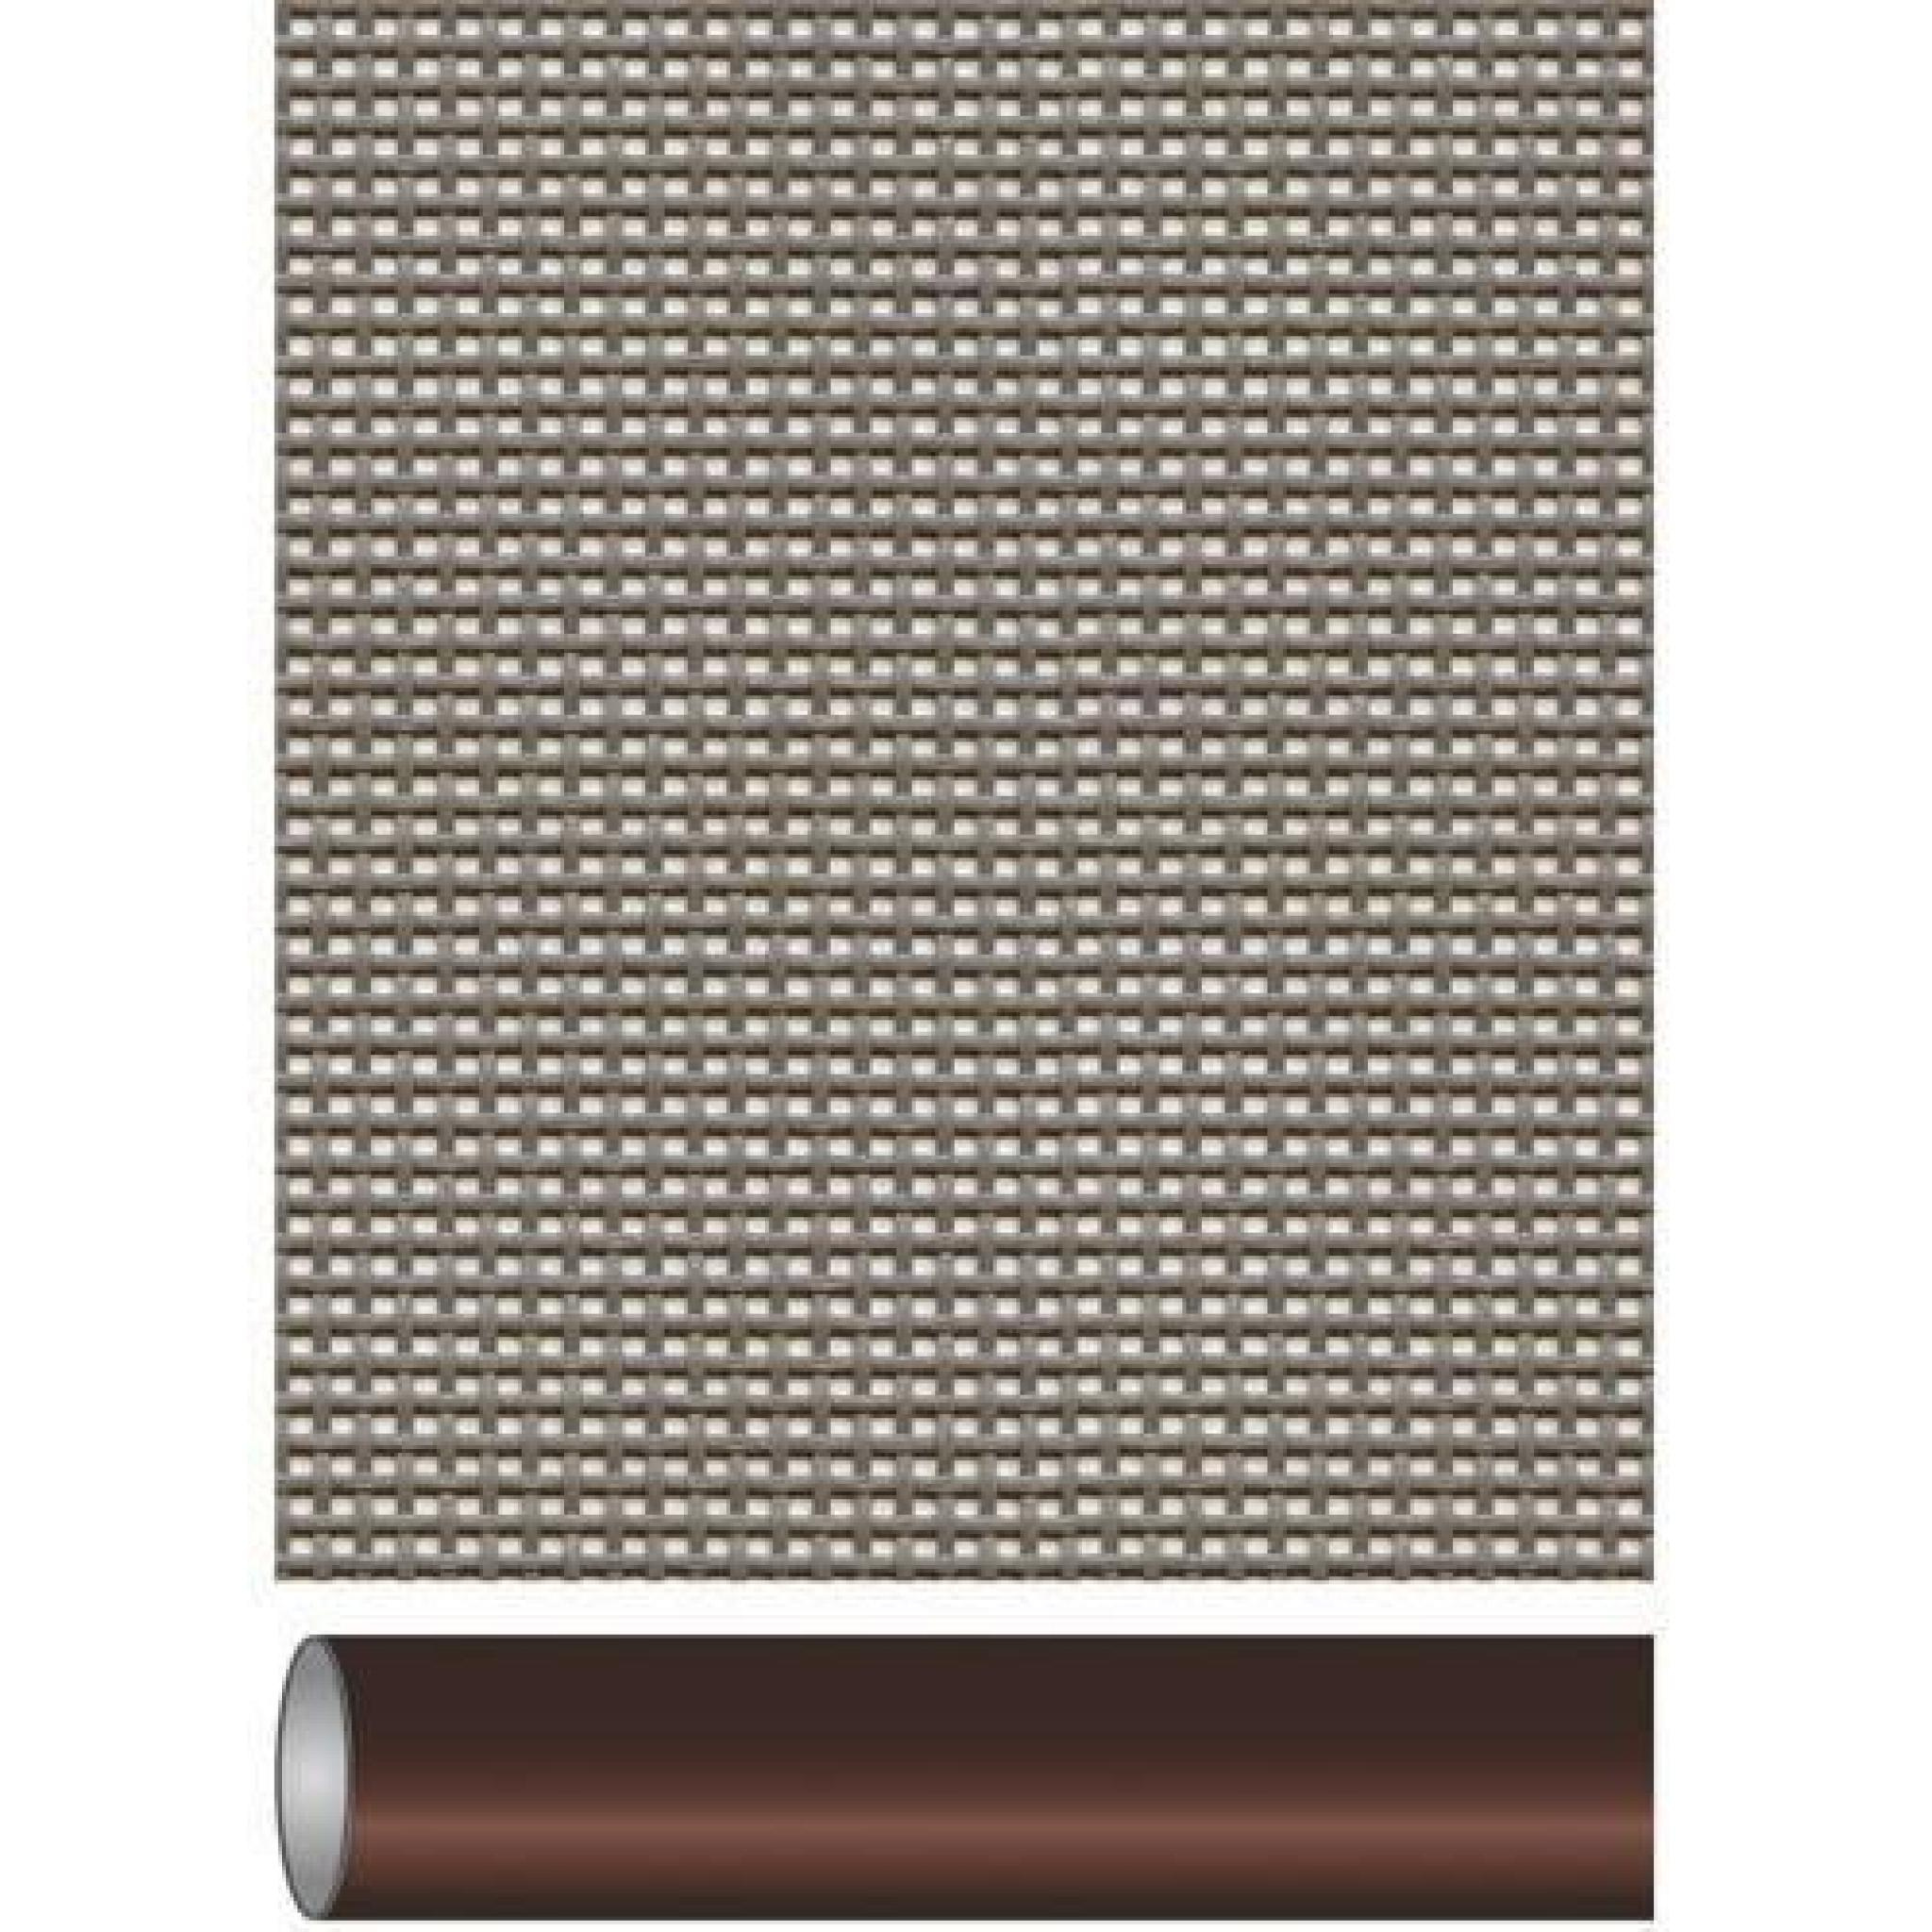 Chaise pliante Lafuma Anytime- Batyline Tendance Beige (tissage 1 fil - 1  fil)